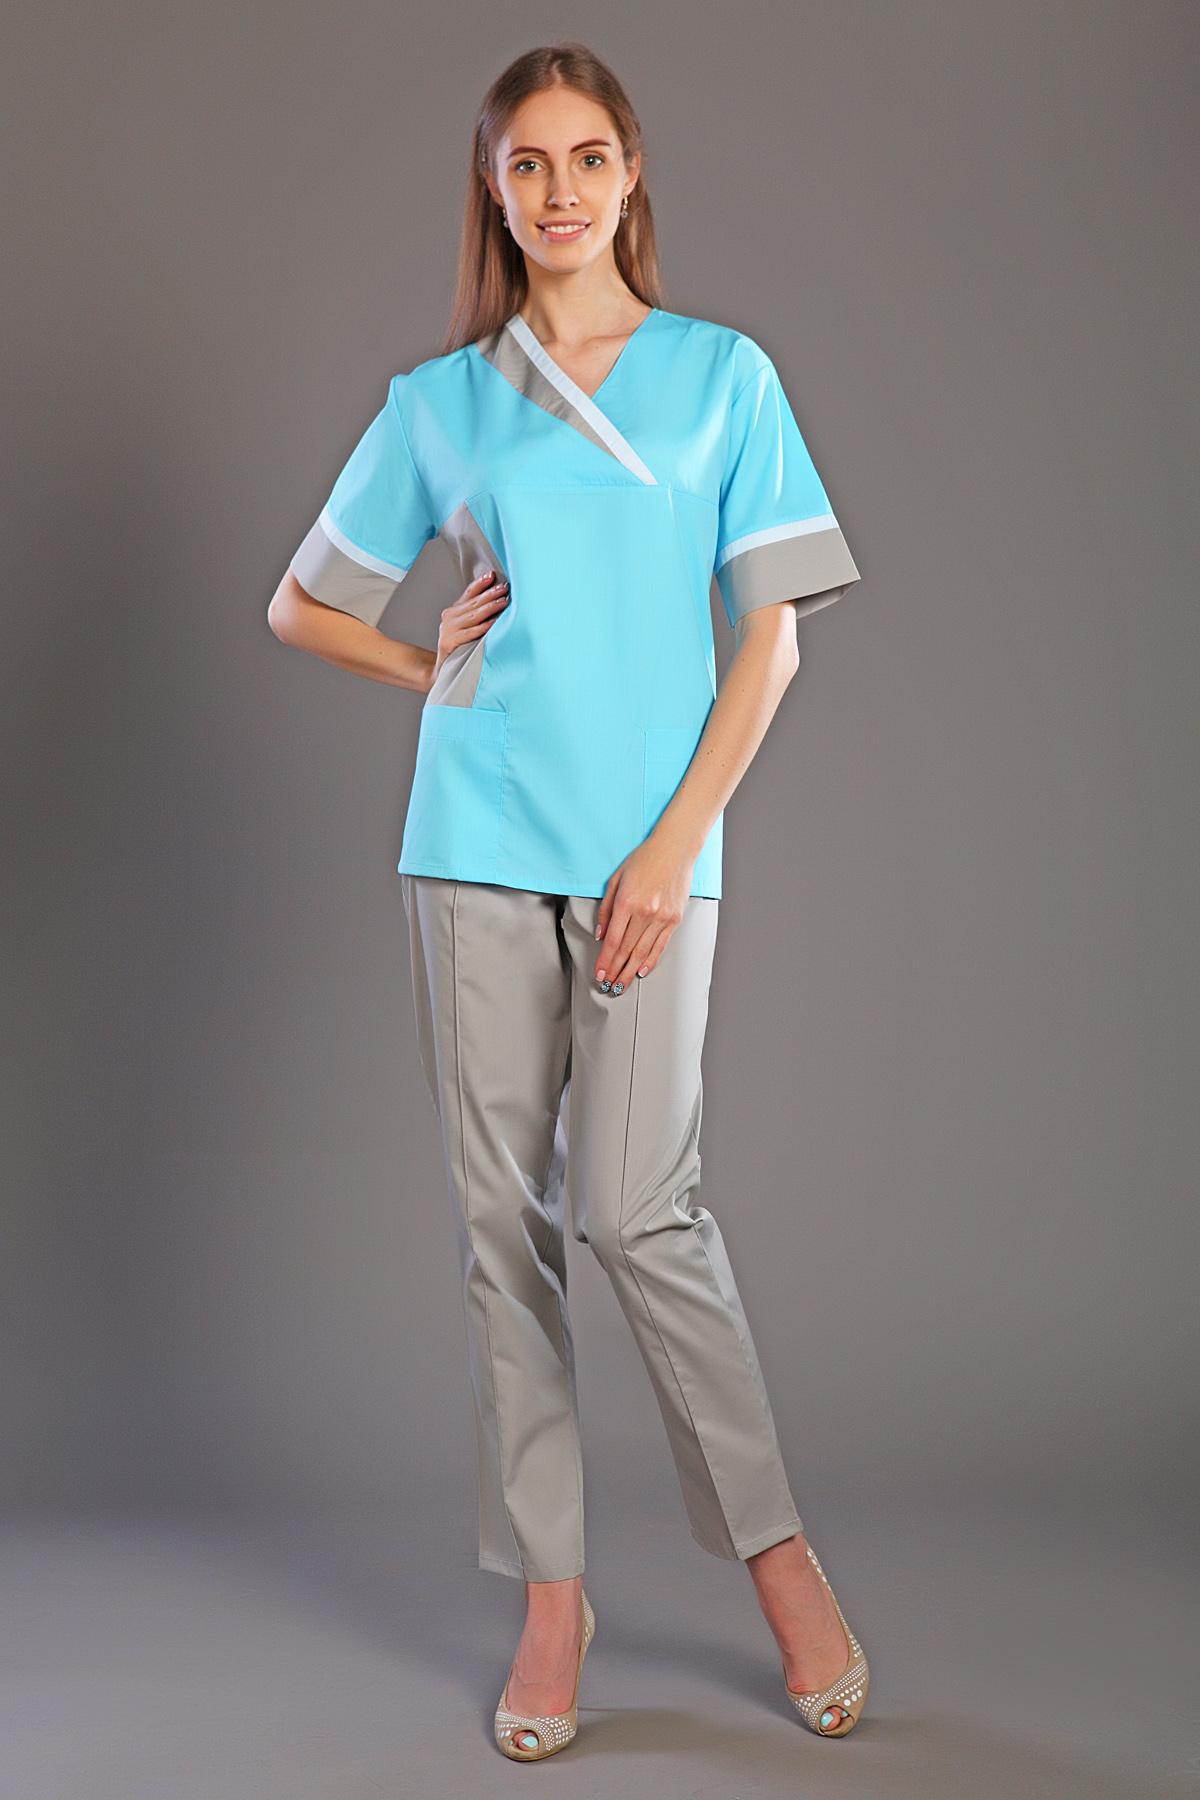 Костюм хирургический женский М-165Костюмы, кофты, брюки<br><br><br>Размер: 56